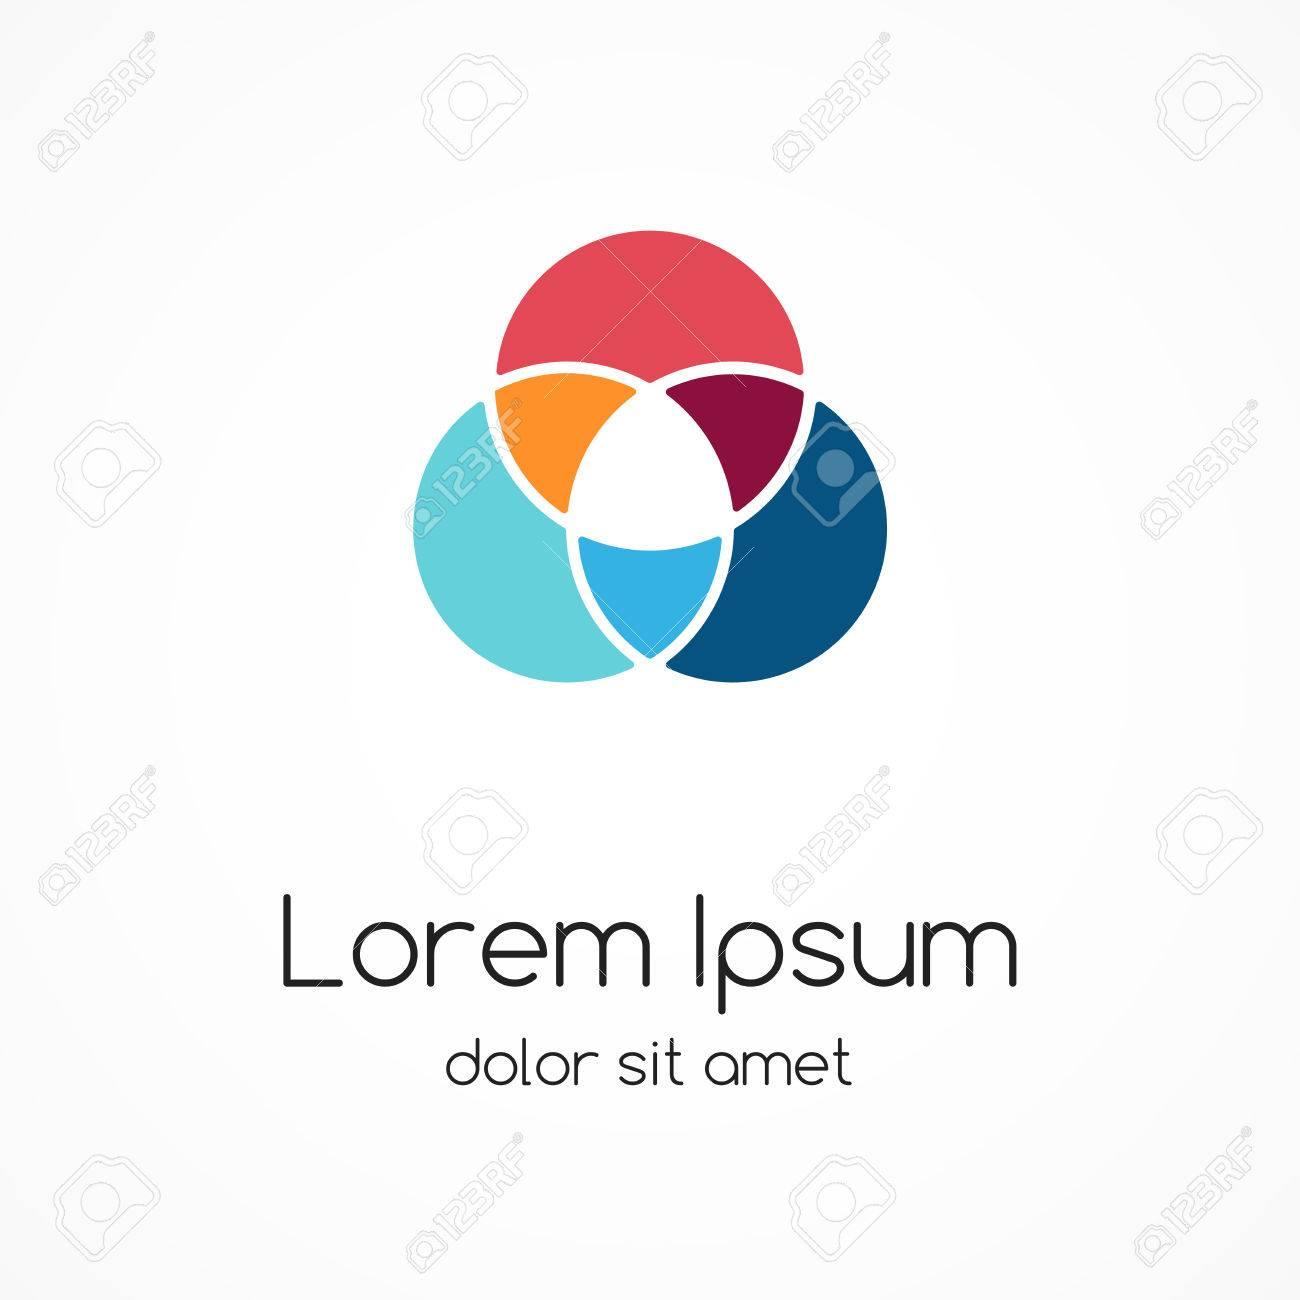 Logo template. Abstract circle creative sign. - 35691171